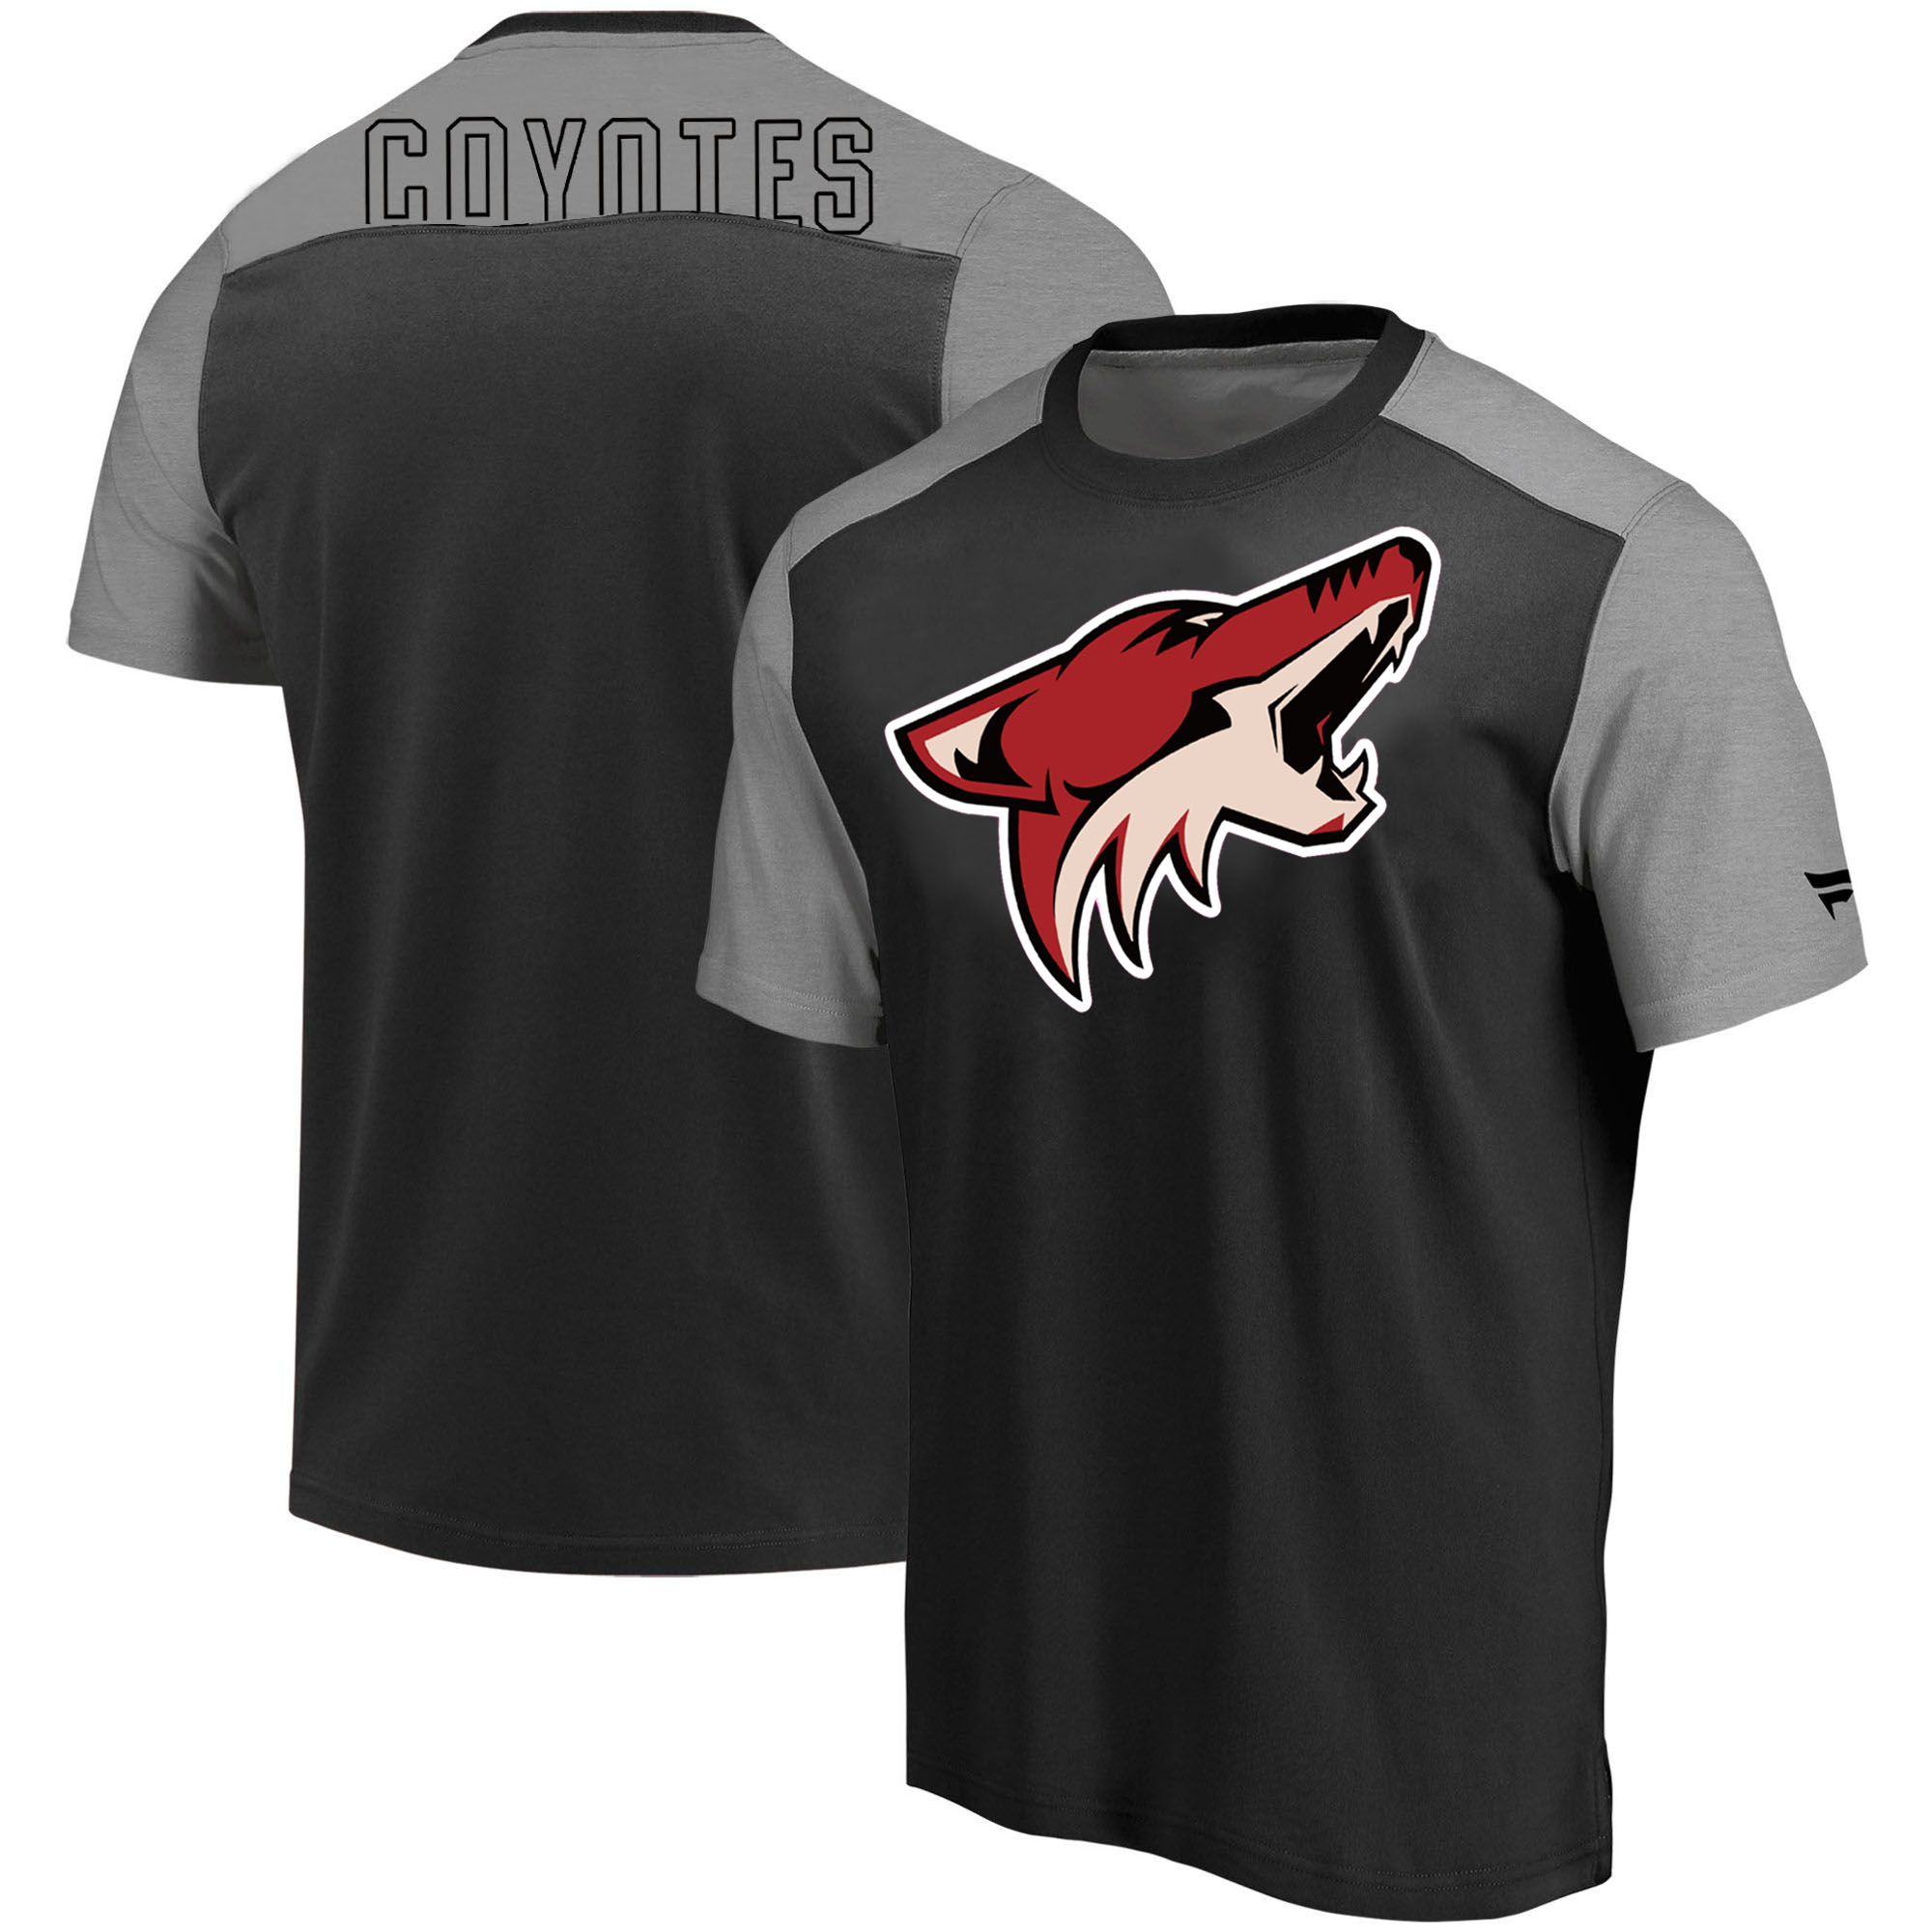 Arizona Coyotes Fanatics Branded Iconic Blocked T-Shirt Black Heathered Gray